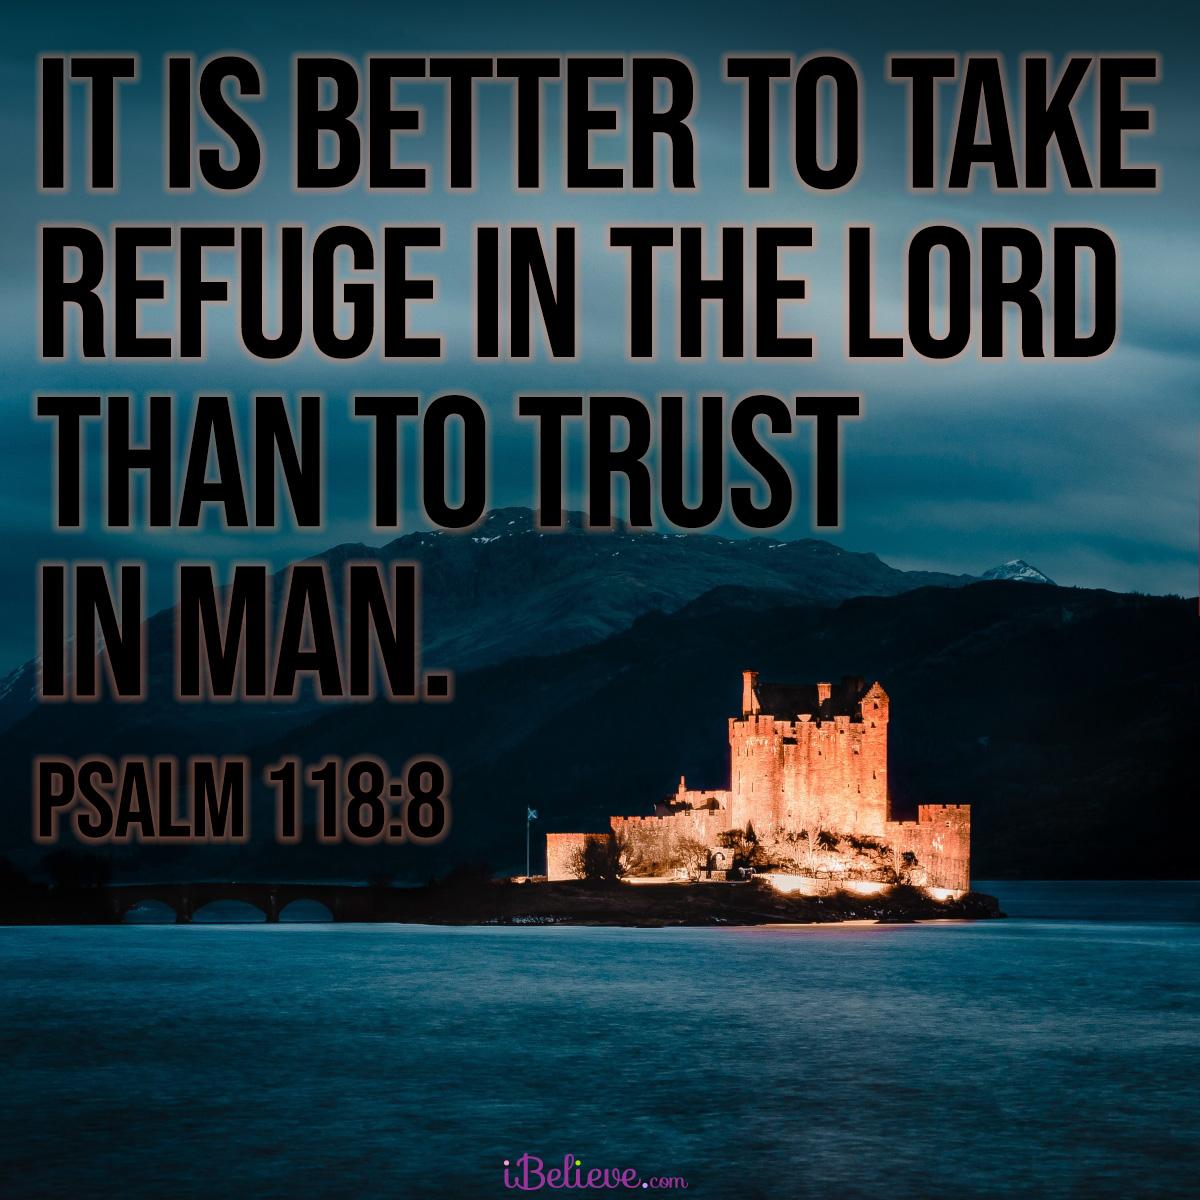 Psalm 118:8 sq